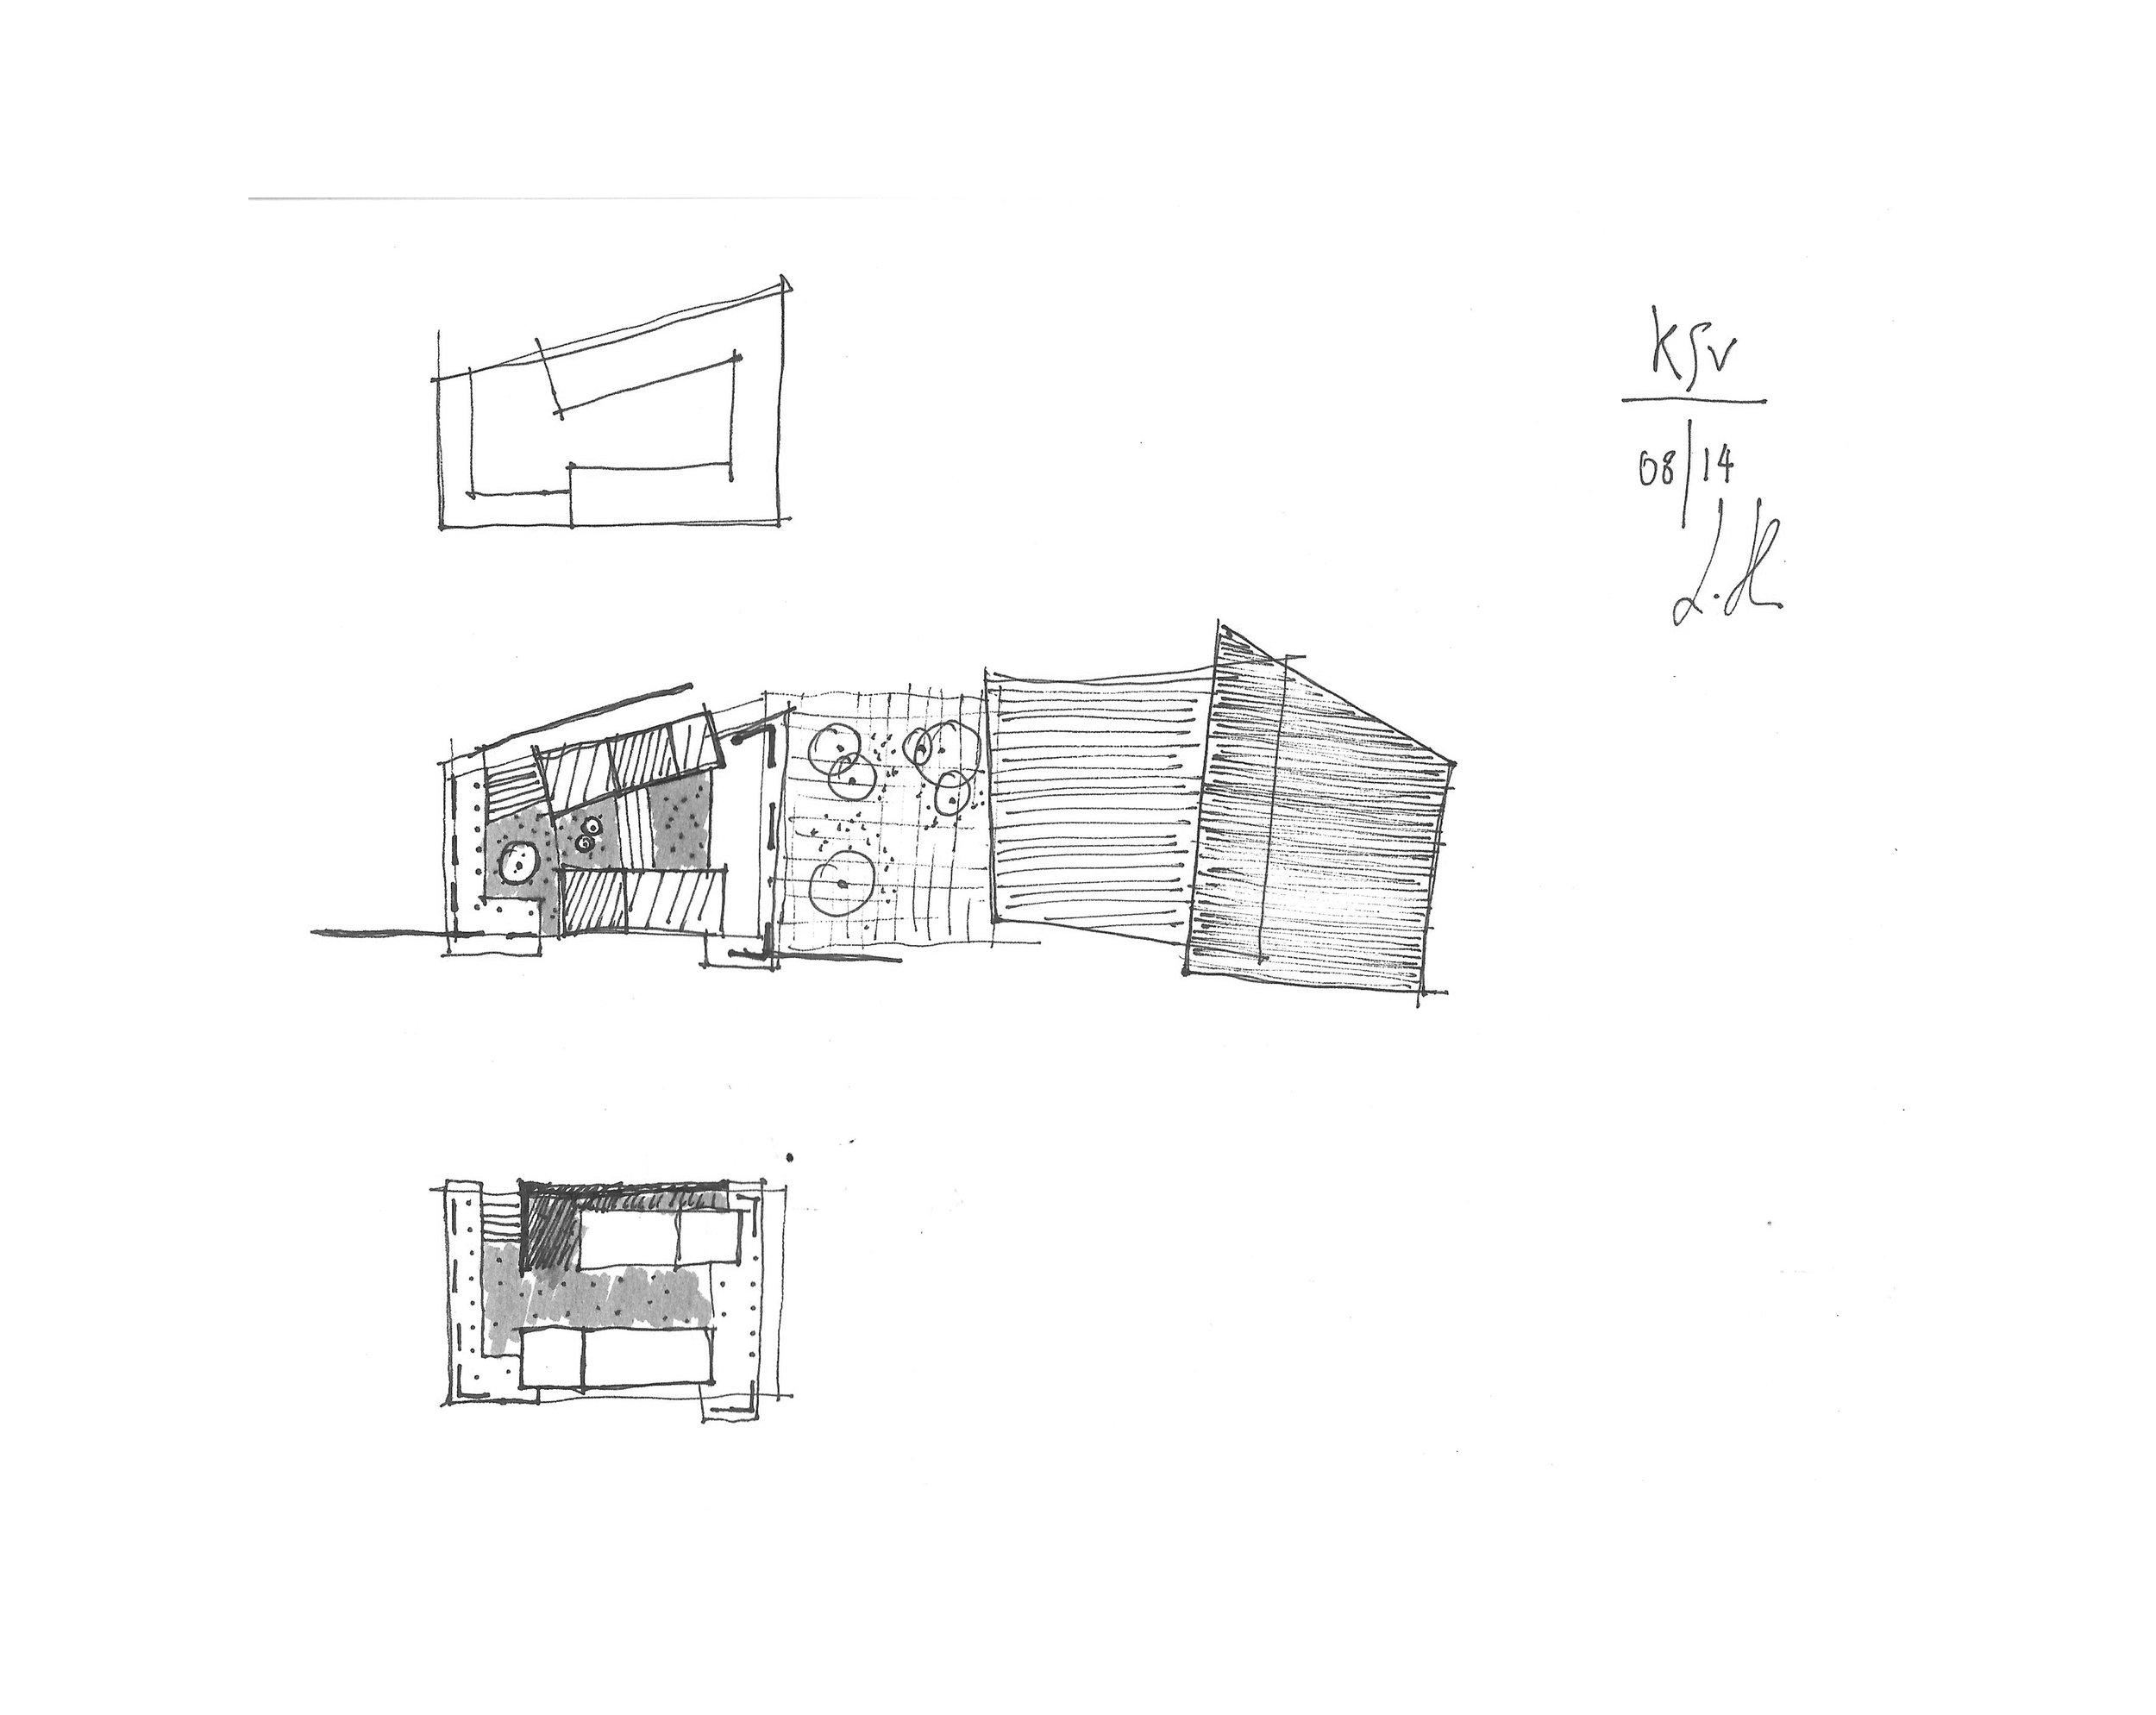 KSV sketch.jpg